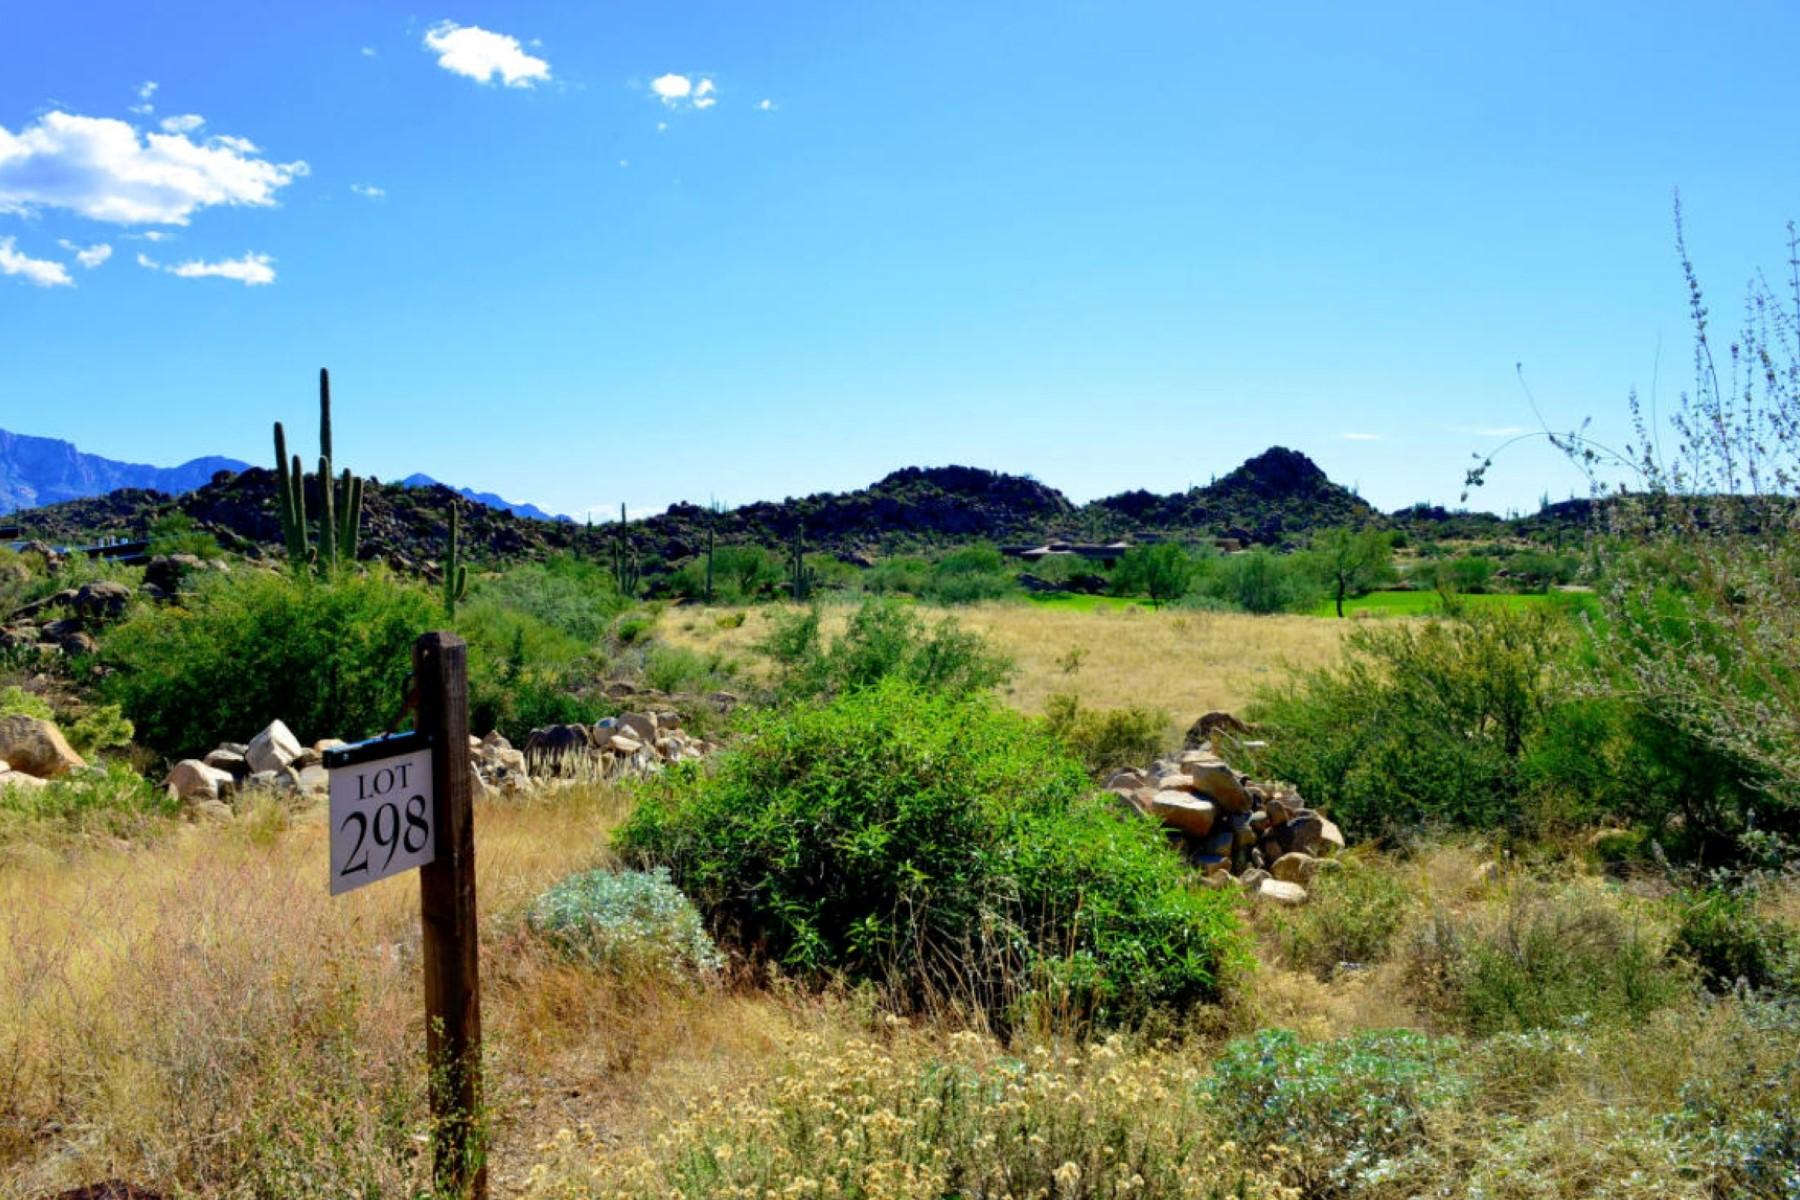 Terreno por un Venta en Stunning Panoramic Views Of 7th Fairway Of Phil Mickelson's Stone Canyon Club 1460 W Tortolita Mountain Circle #298 Oro Valley, Arizona 85755 Estados Unidos